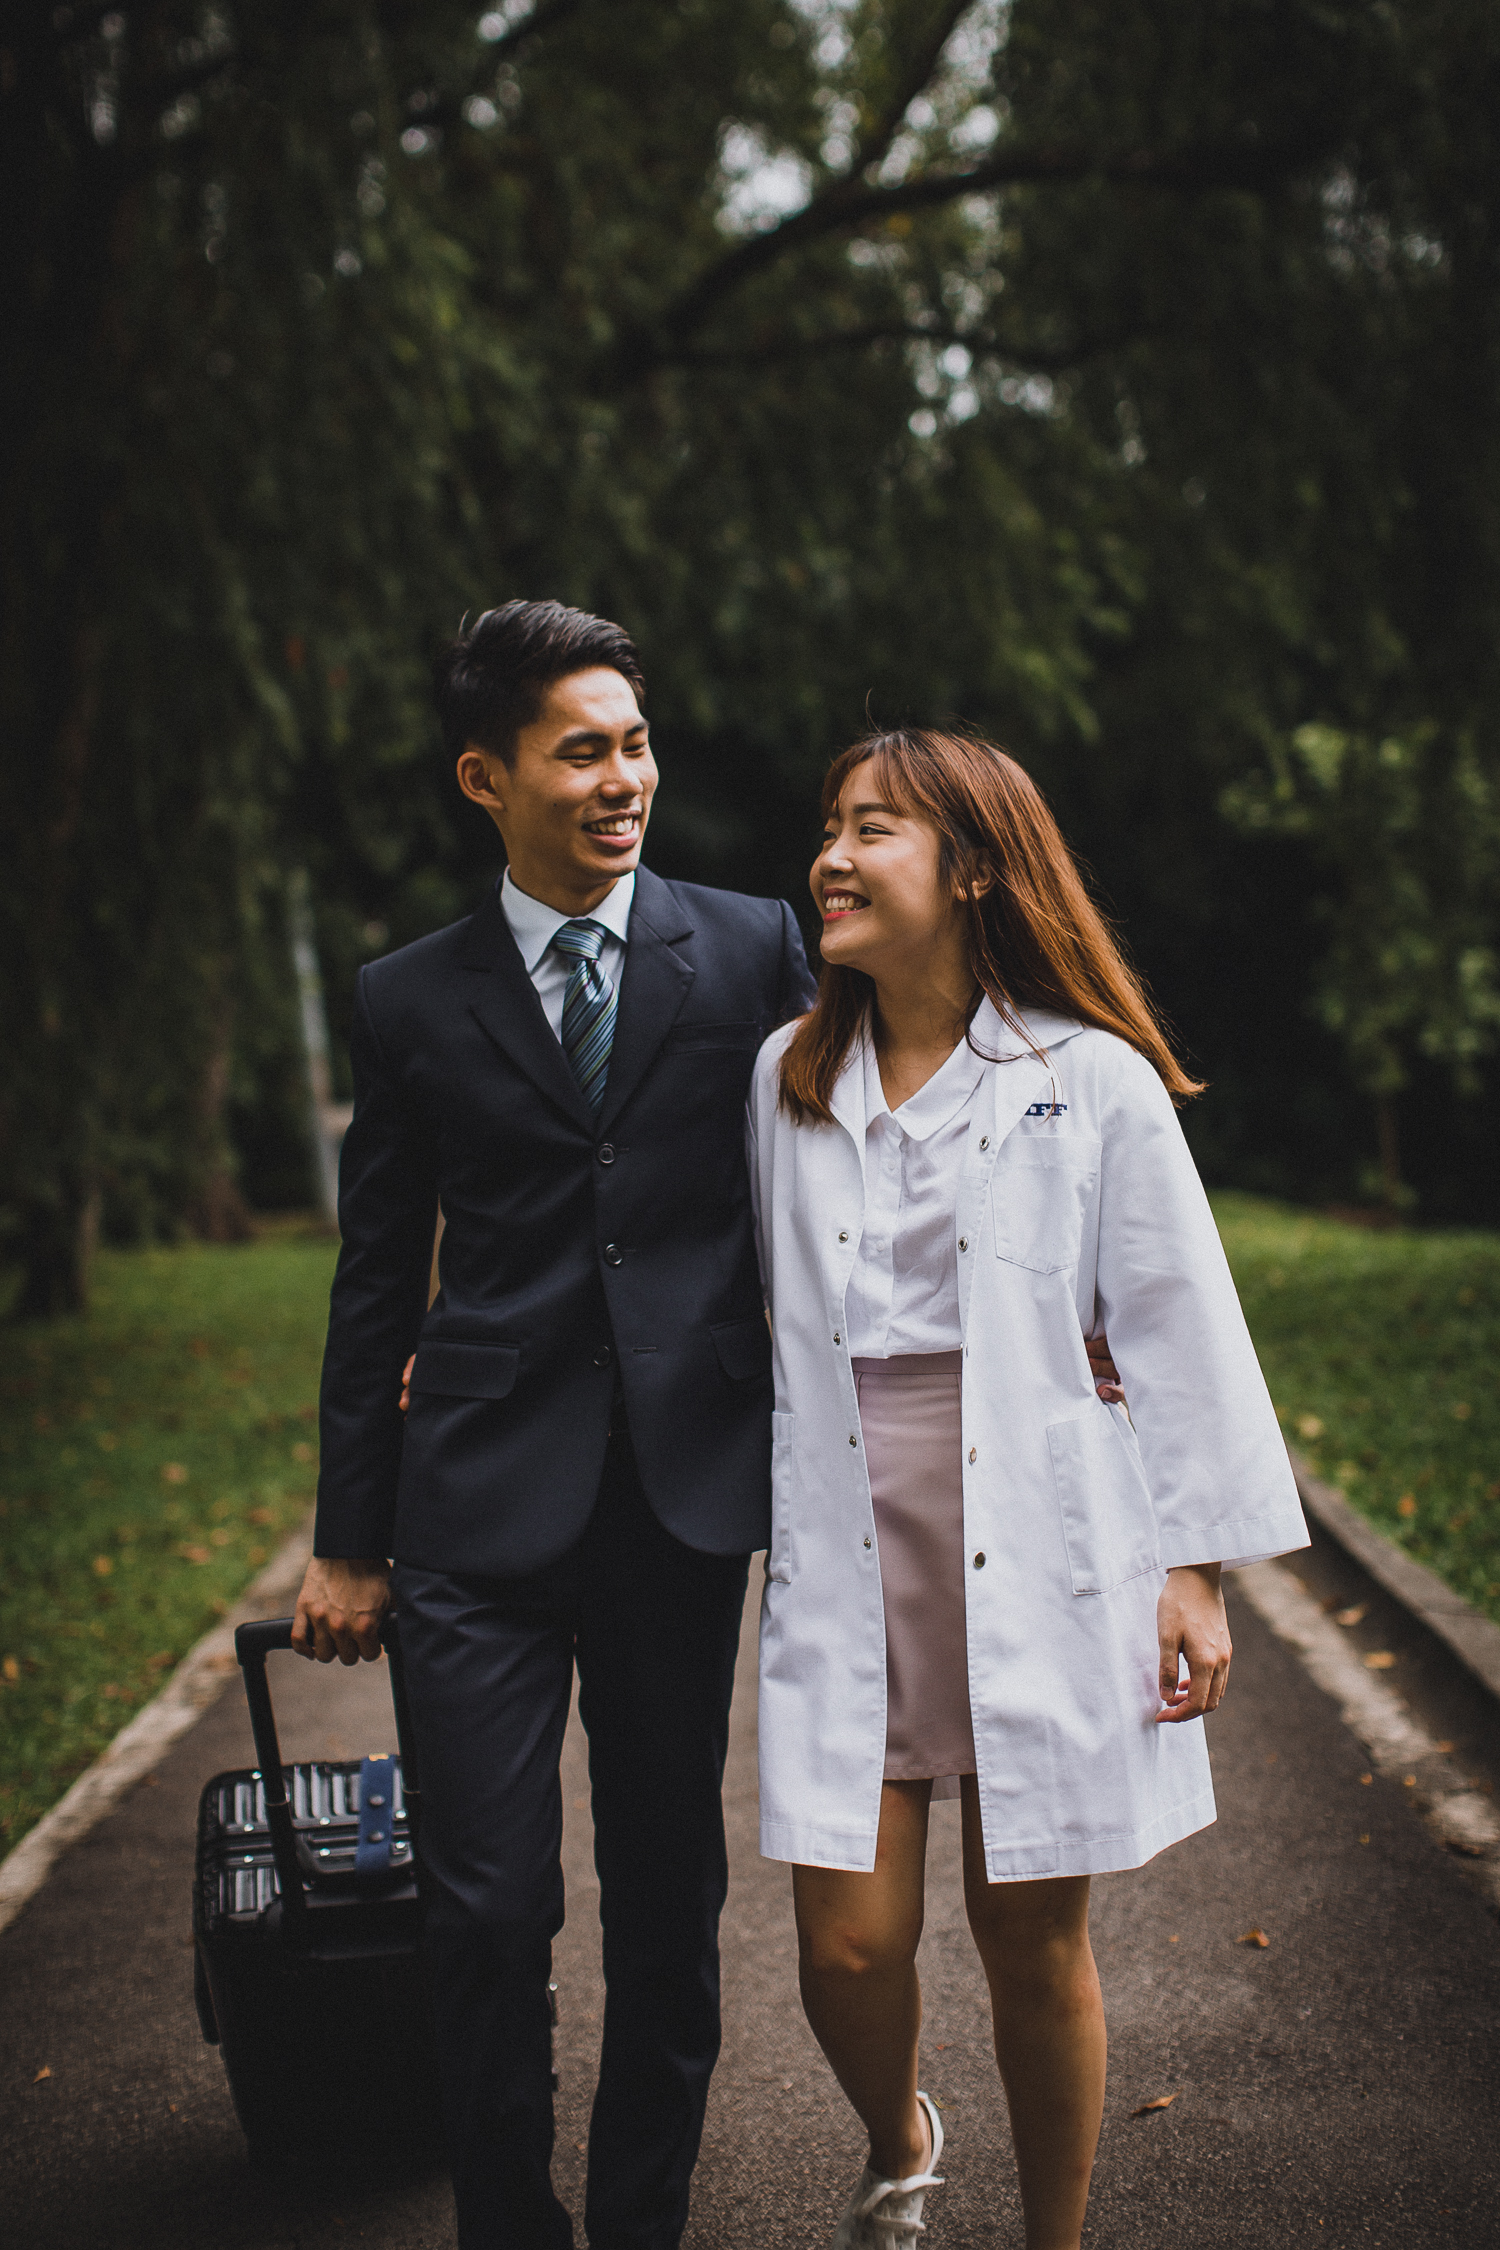 Singapore+Wedding+Photographer+Pre-Wedding+Couple+Zhiyu+Huimin-0033.jpg